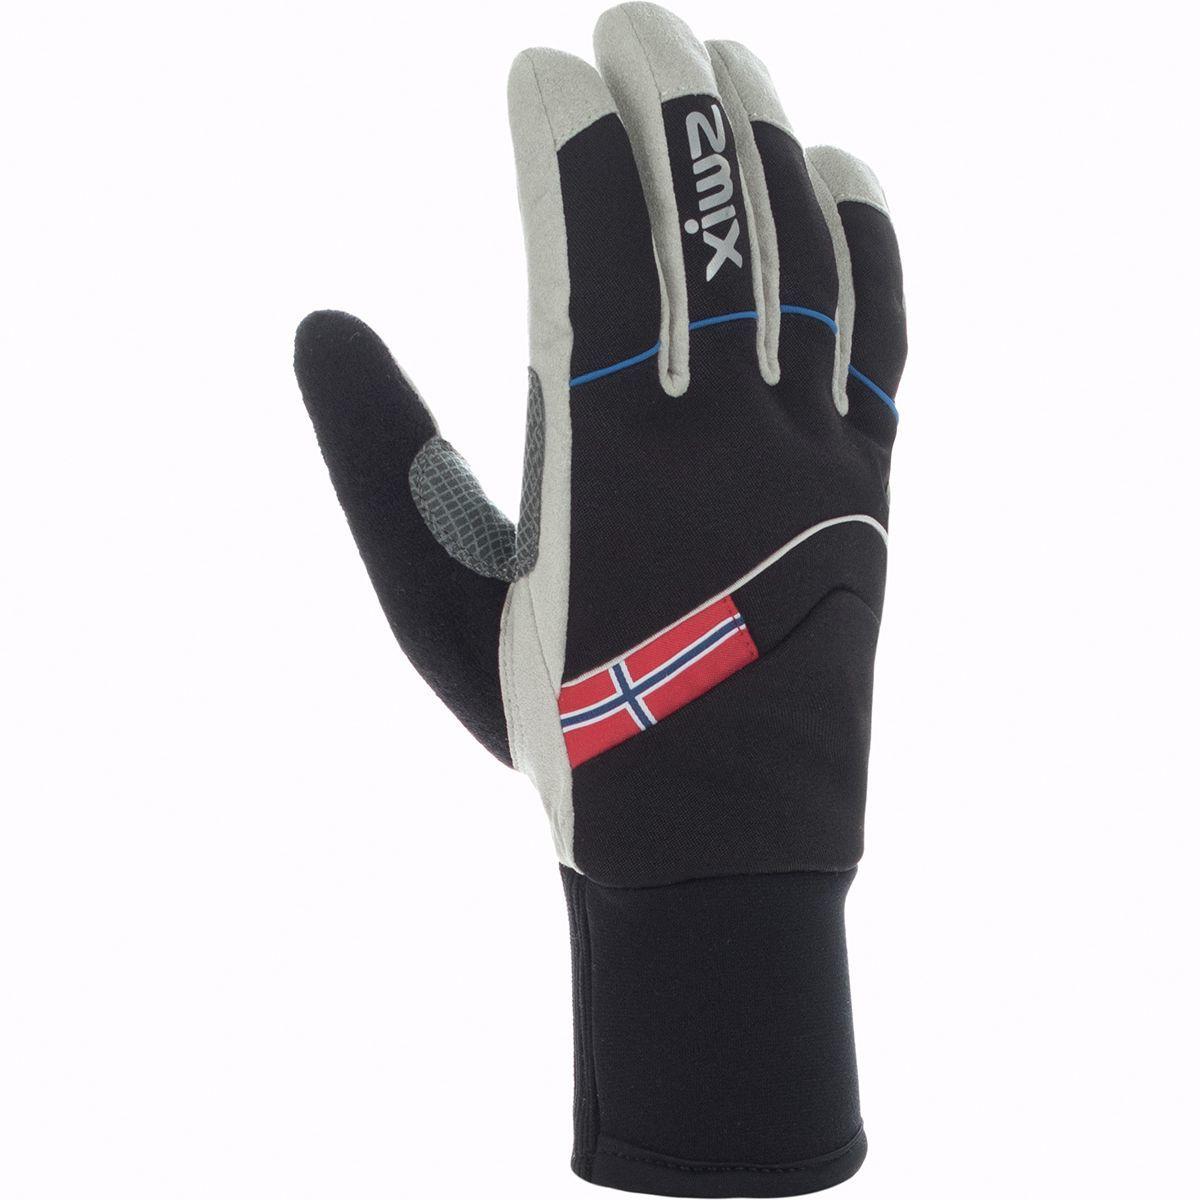 Swix Shield Glove - Women's